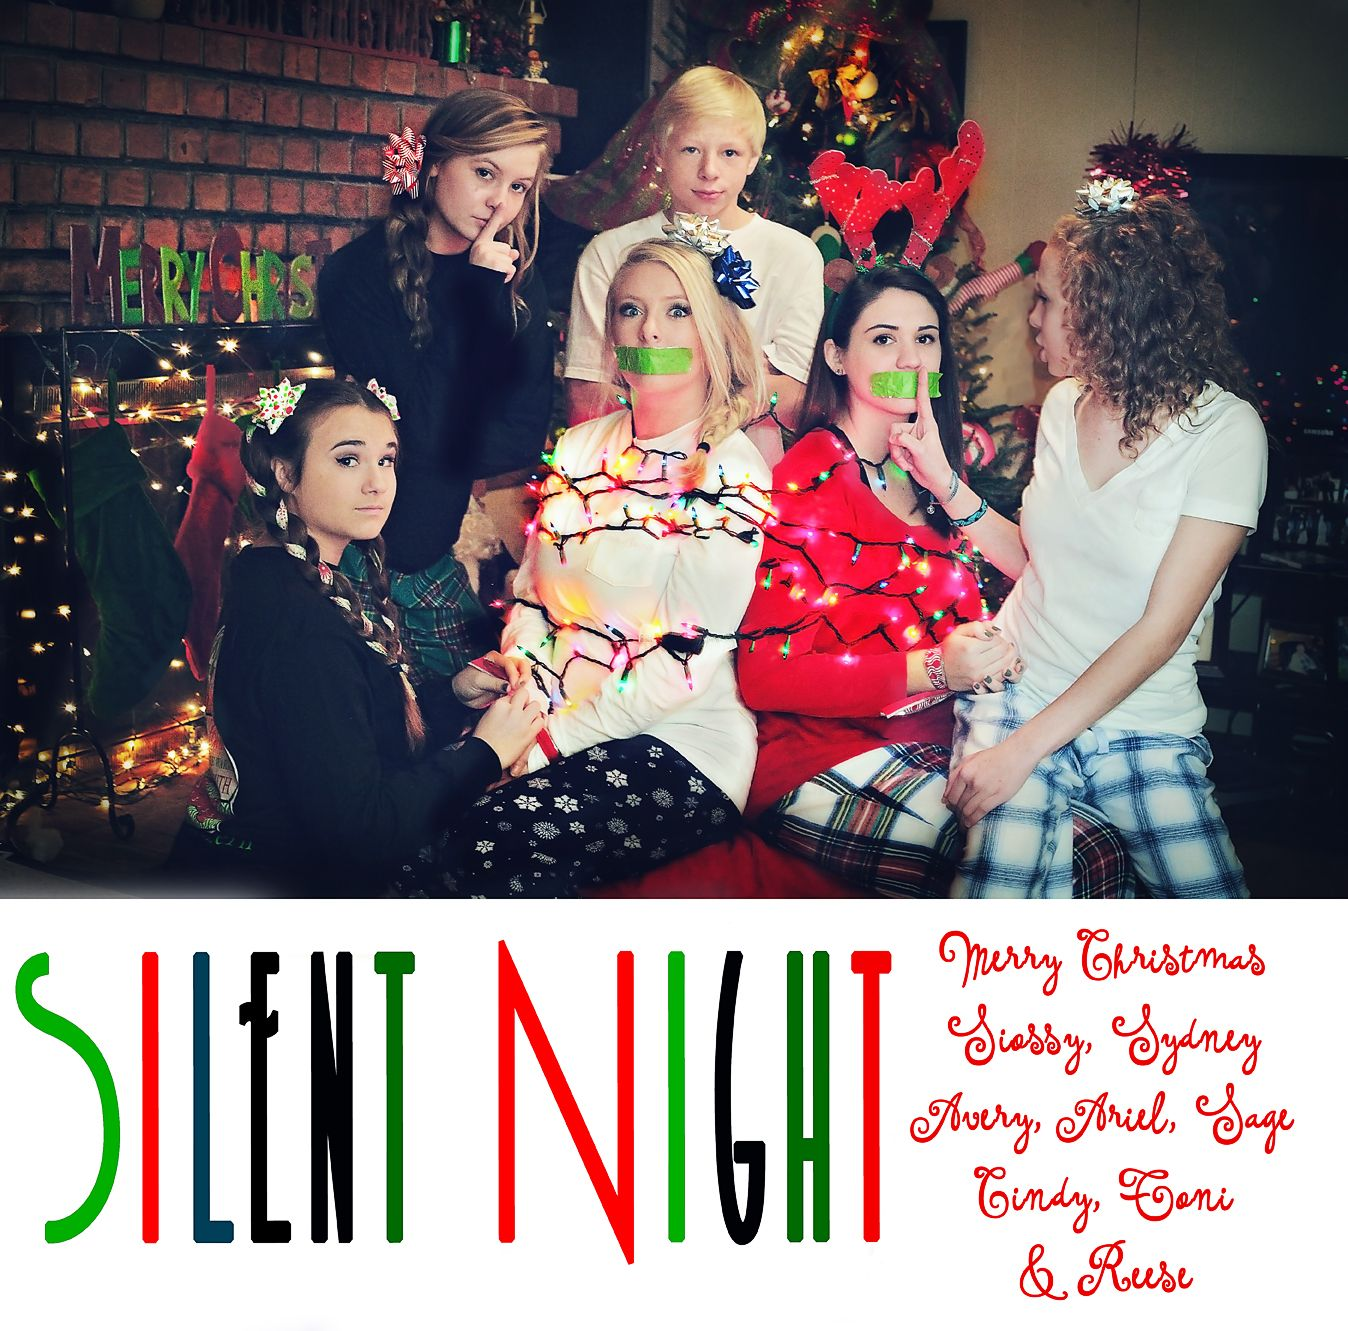 Fun Family Christmas card. Cynthiajillphoto.net Conyers GA Silent night  duck tape Naughty nice